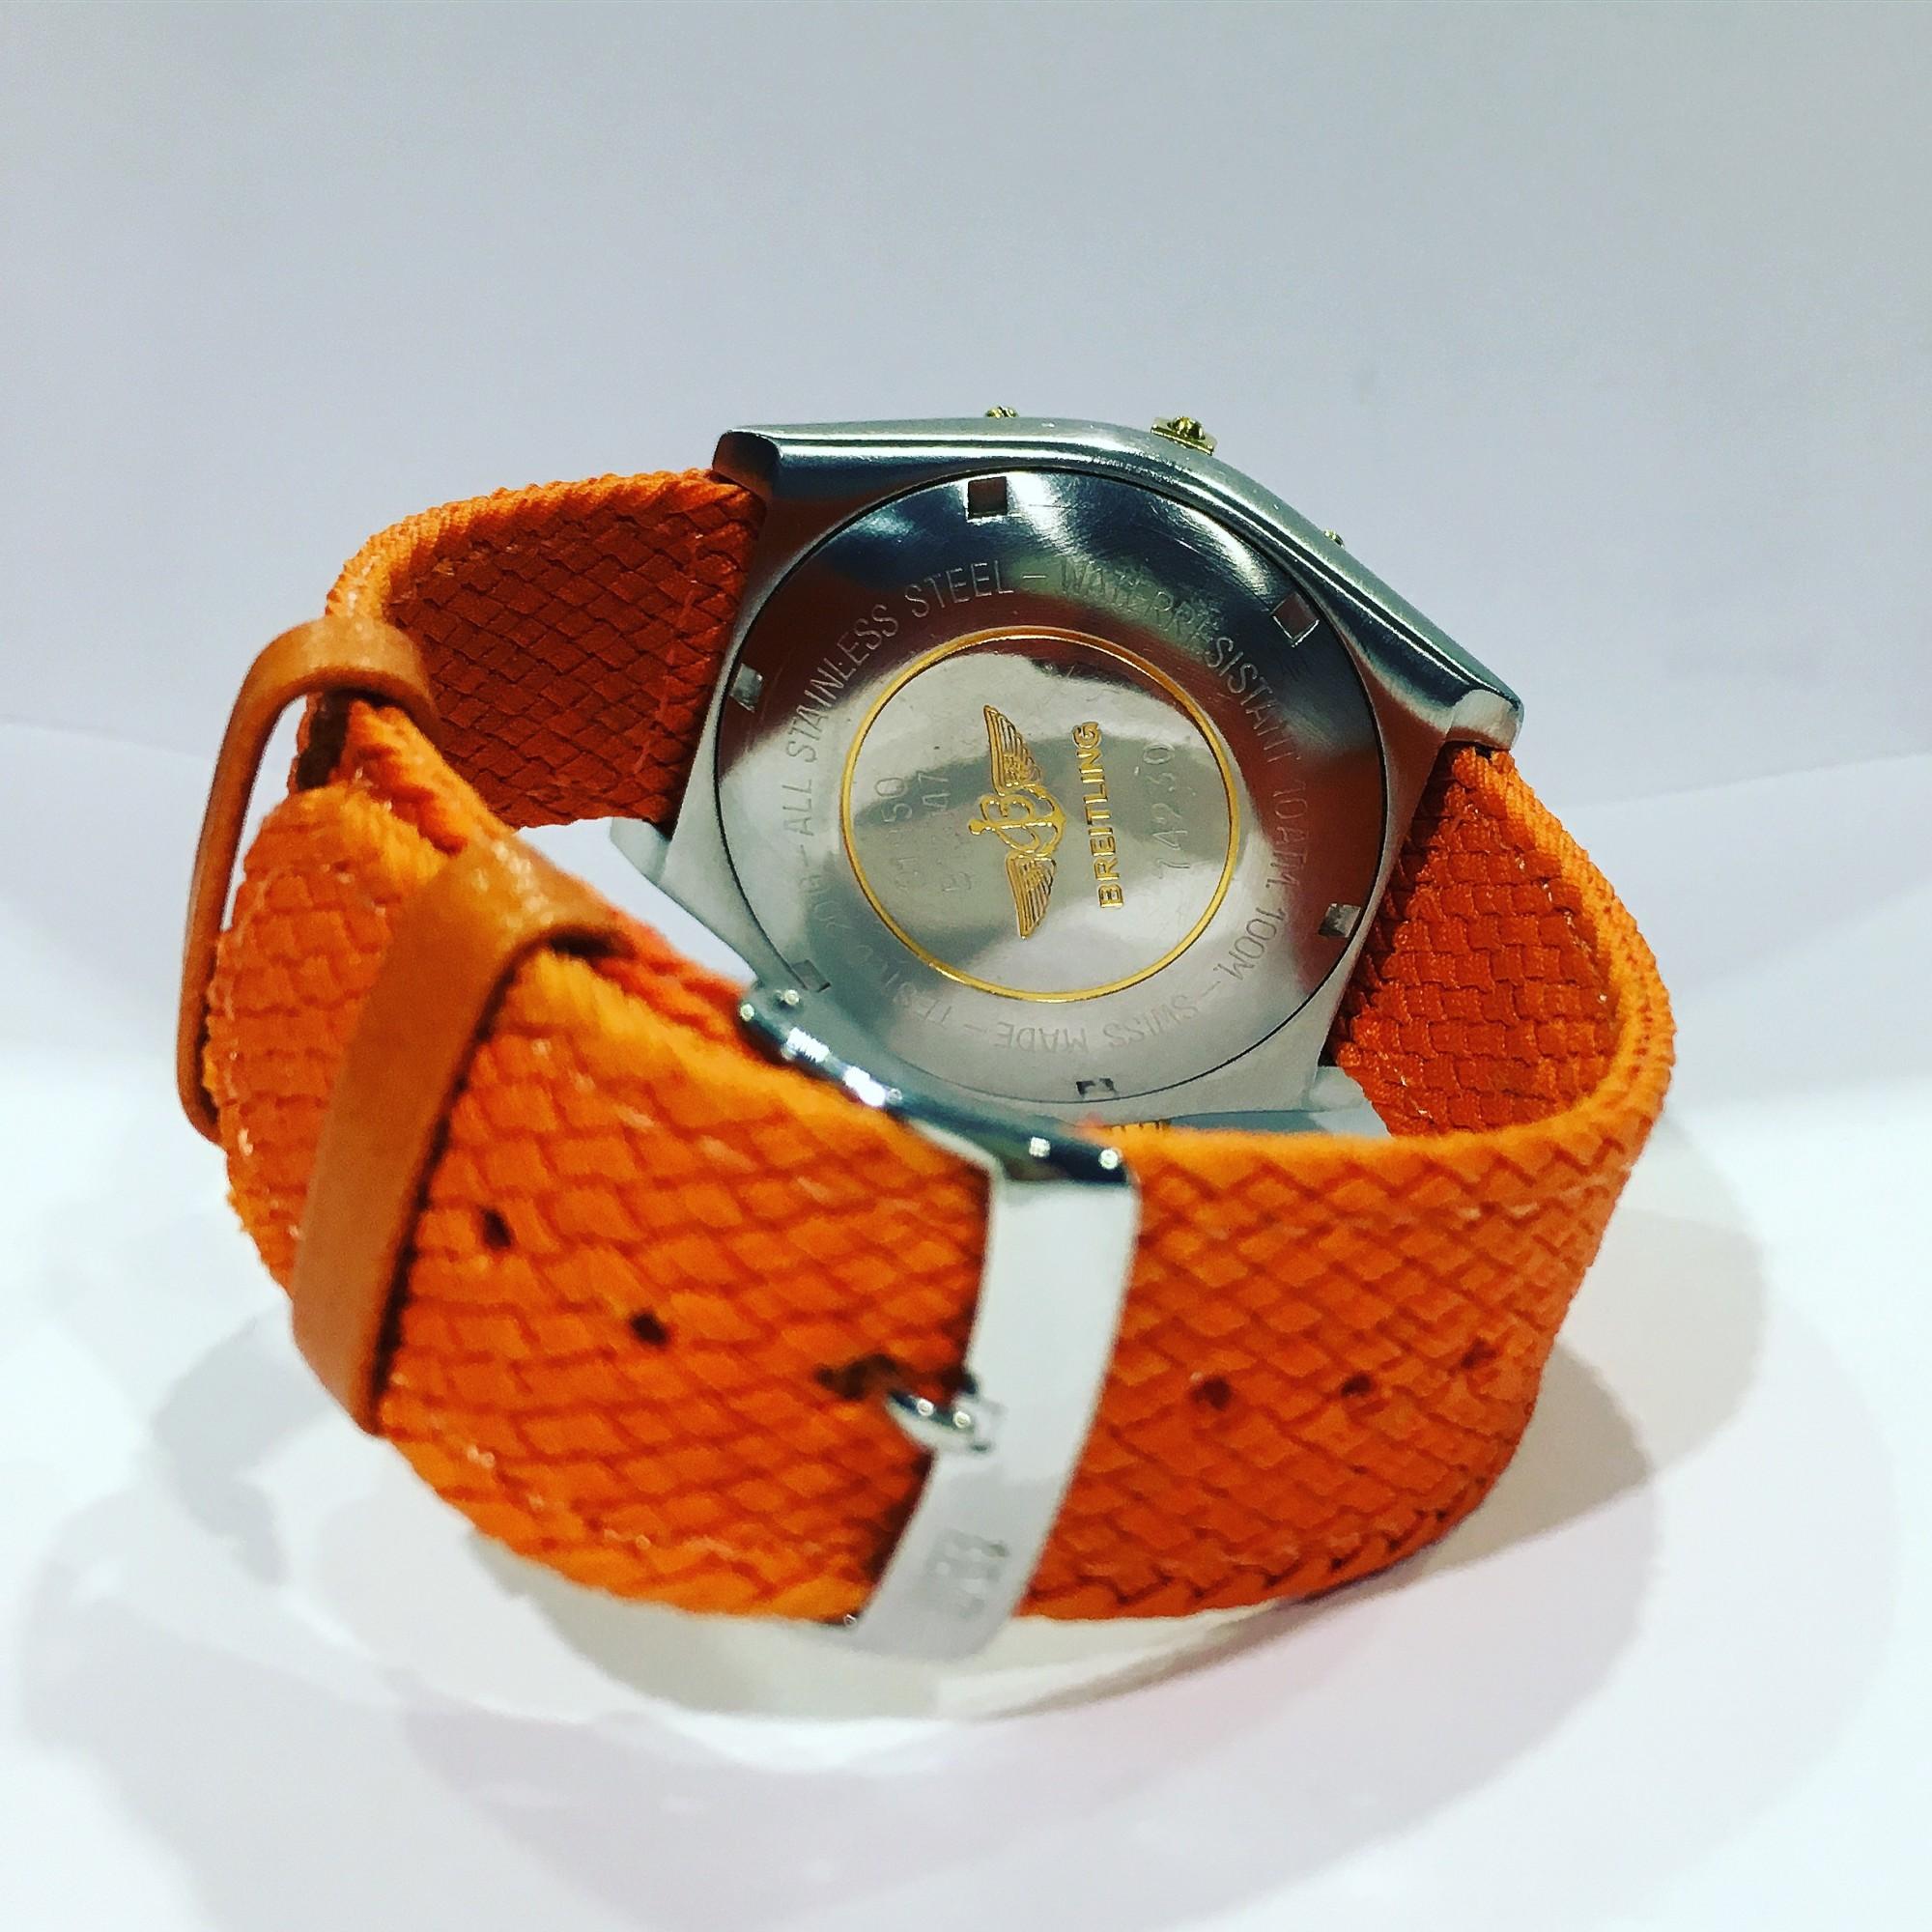 Montre occasion Breitling Chronomat Chronographe Yachting Regatta.